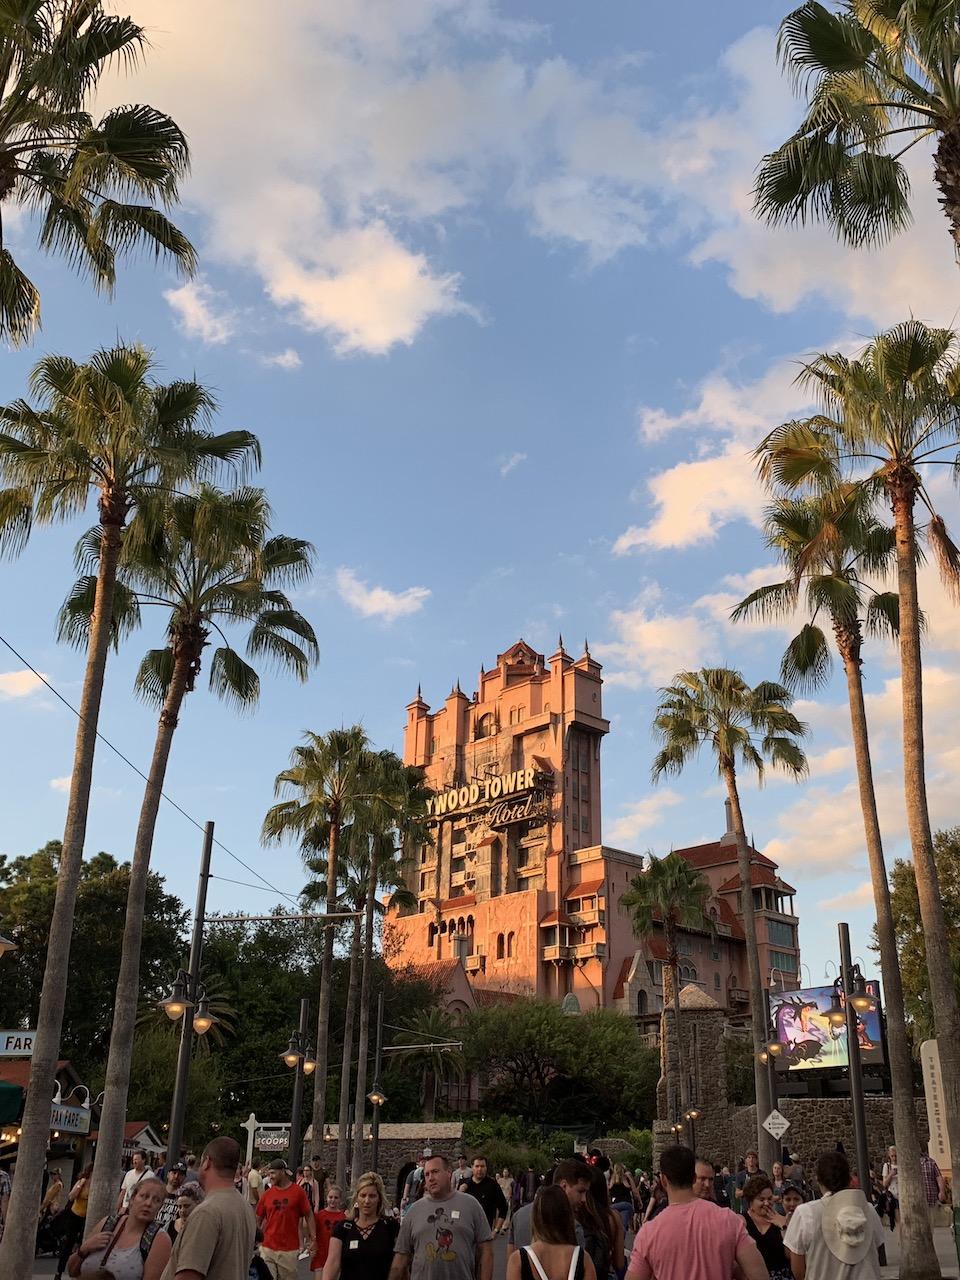 hollywood studios best rides tower of terror.jpeg